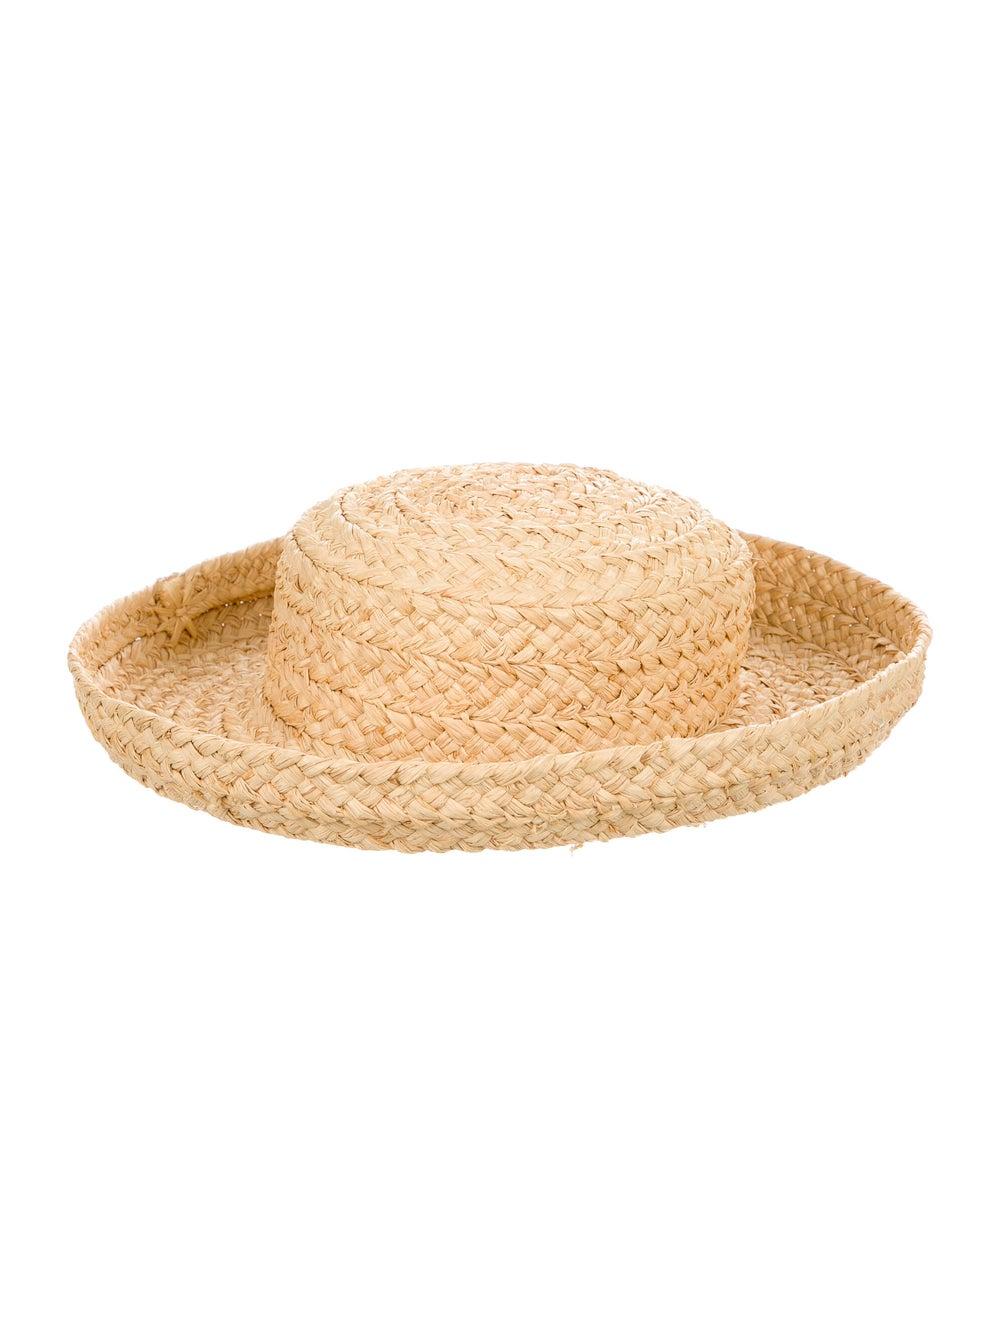 Kaminski Straw Wide Brim Hat Tan - image 2